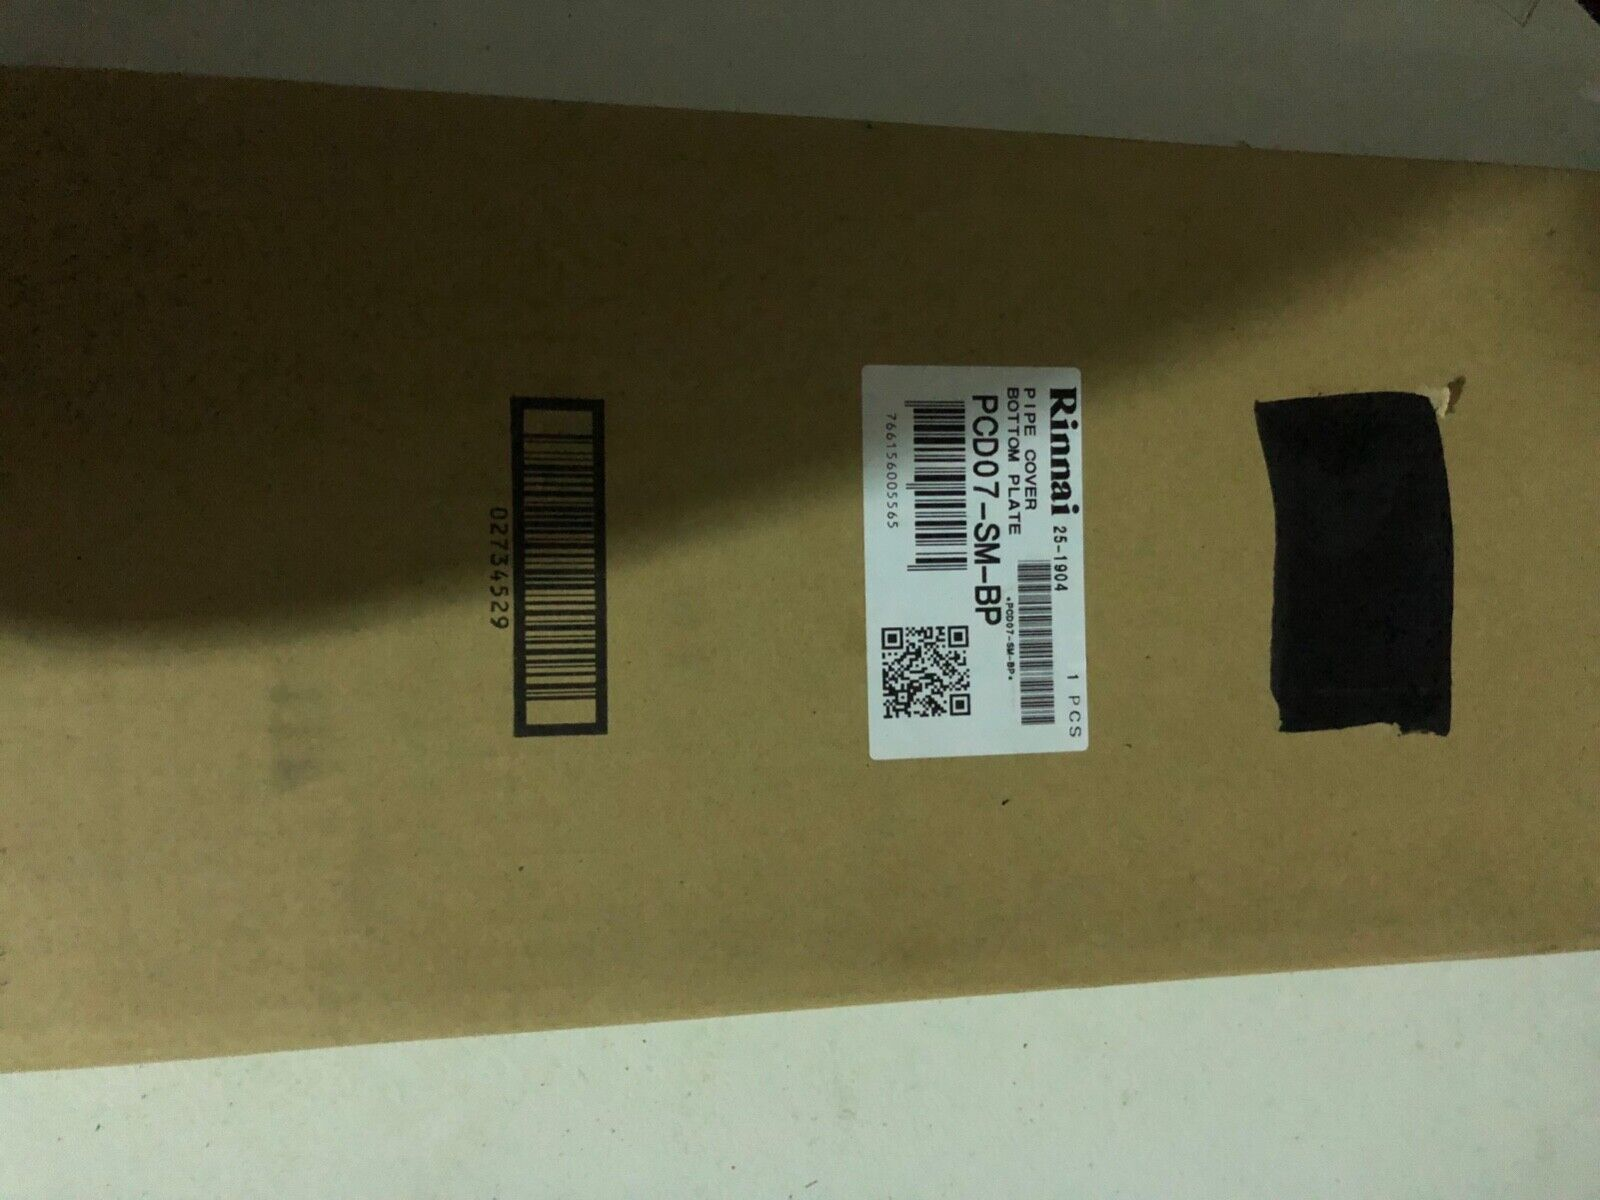 Rinnai PCD07-SM-Bp Pipe Cover Enclosure - $30.00